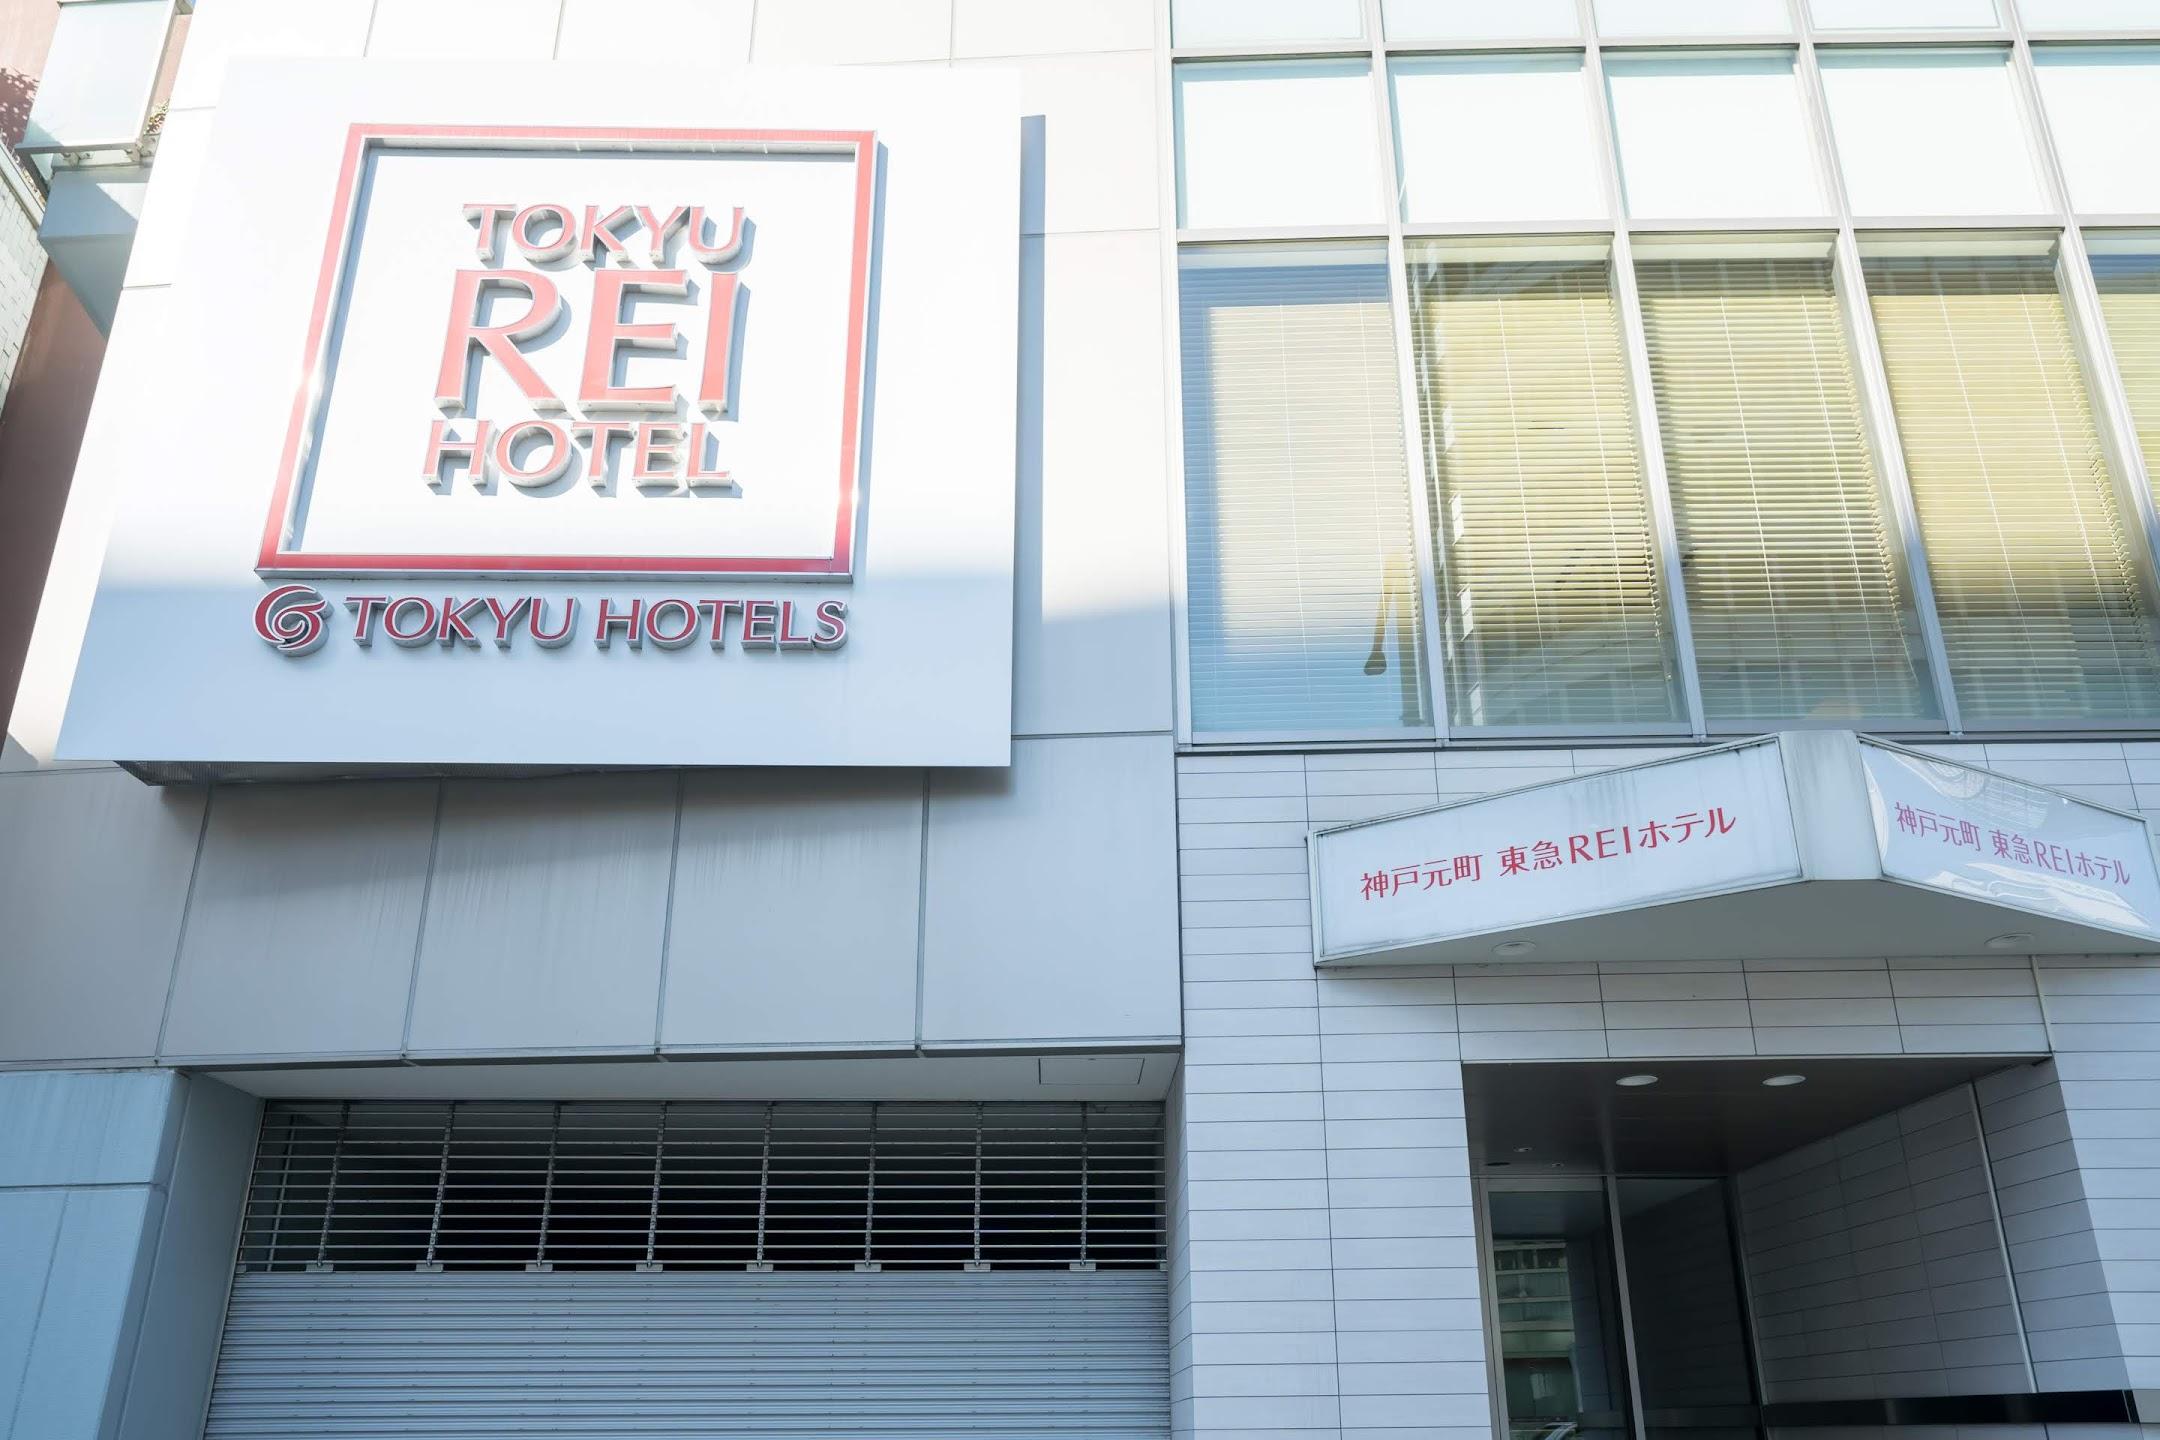 神戸元町 東急REIホテル